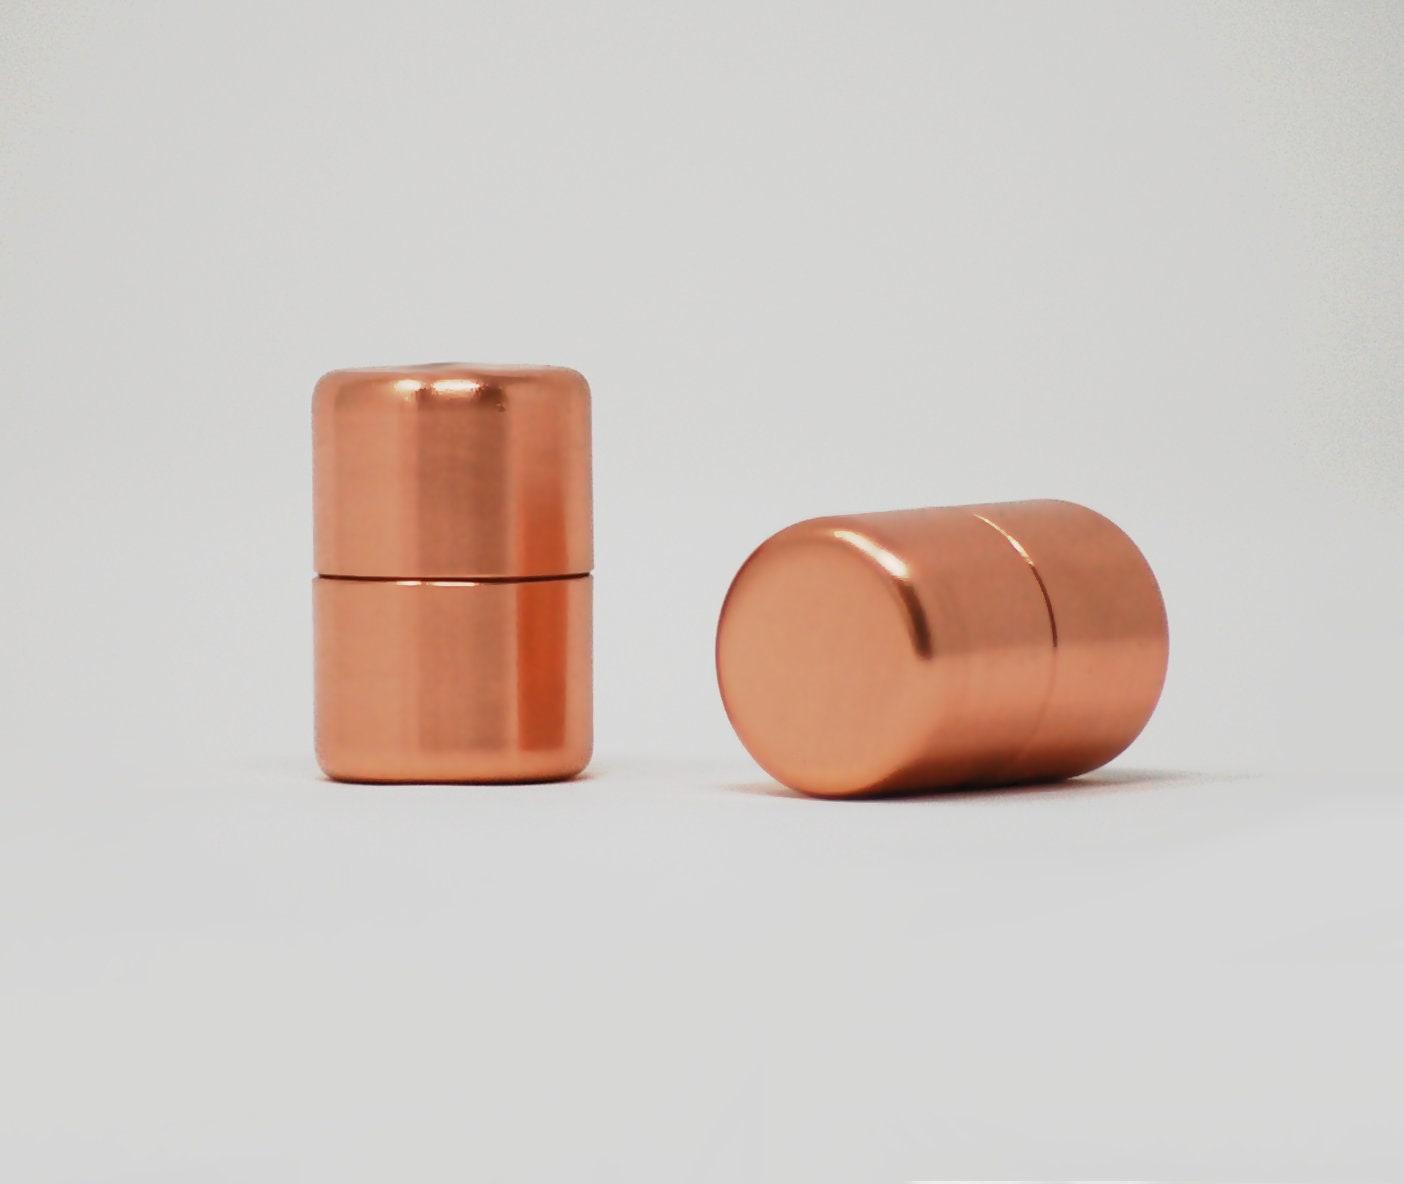 QuirkHub® Minimod Knopf Kupfer Knopf Kupfer Knöpfe und | Etsy